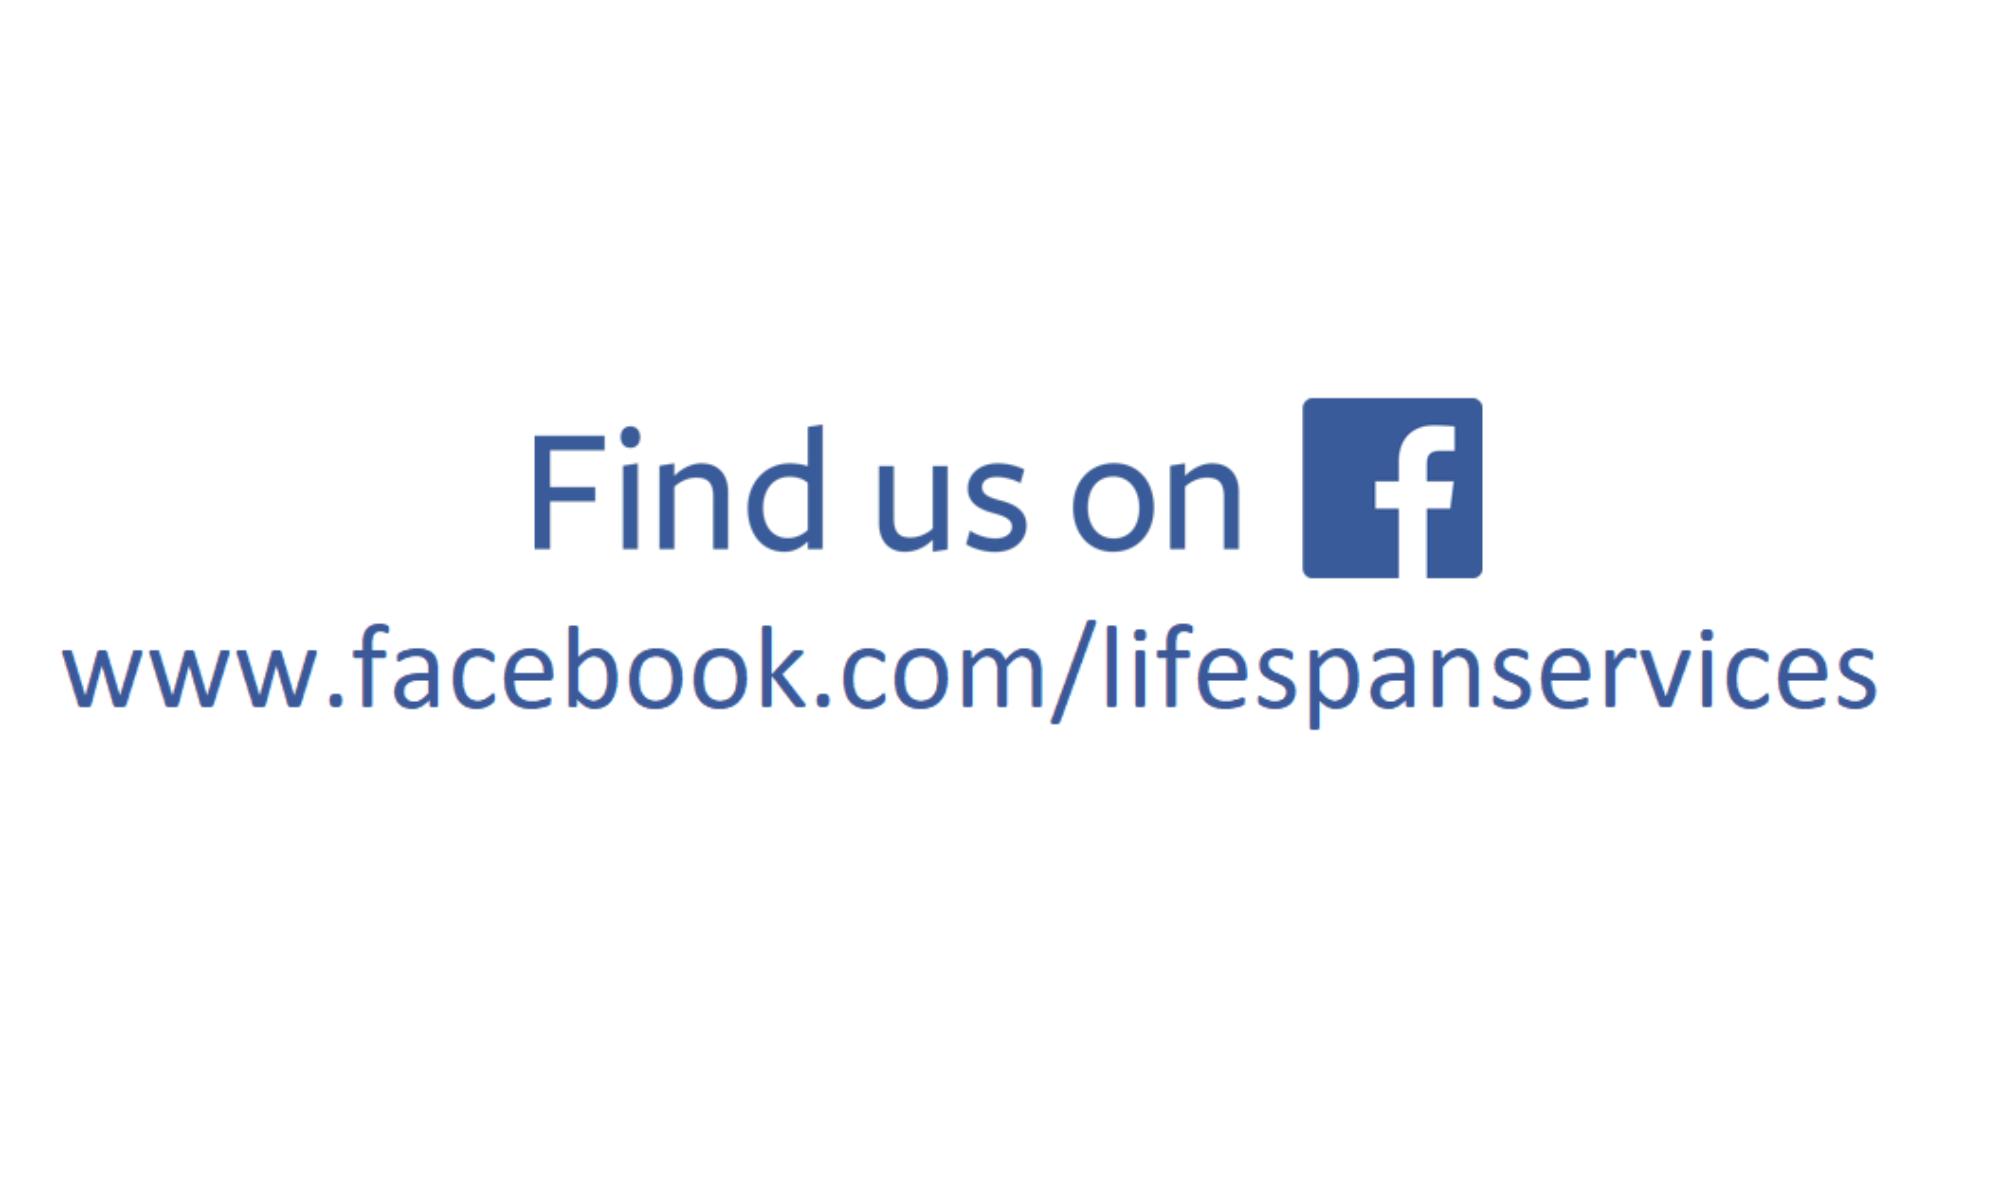 Lifespan Services Inc